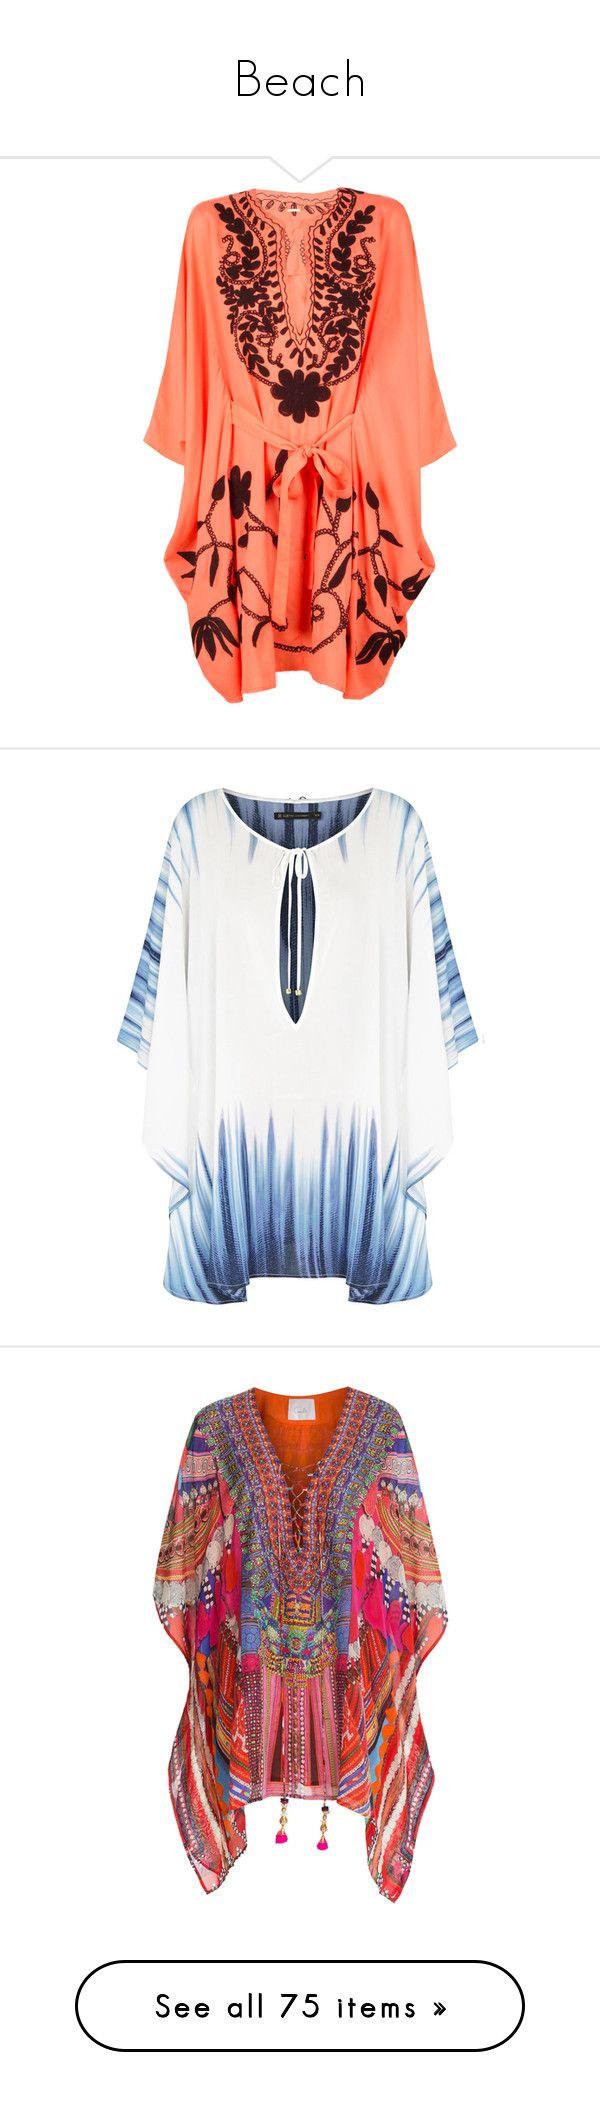 """Beach"" by sara-488 ❤ liked on Polyvore featuring dresses, tops, kaftan, vestidos, swimwear, coral, tie belt, pas pour toi, beach caftan and beach kaftan"